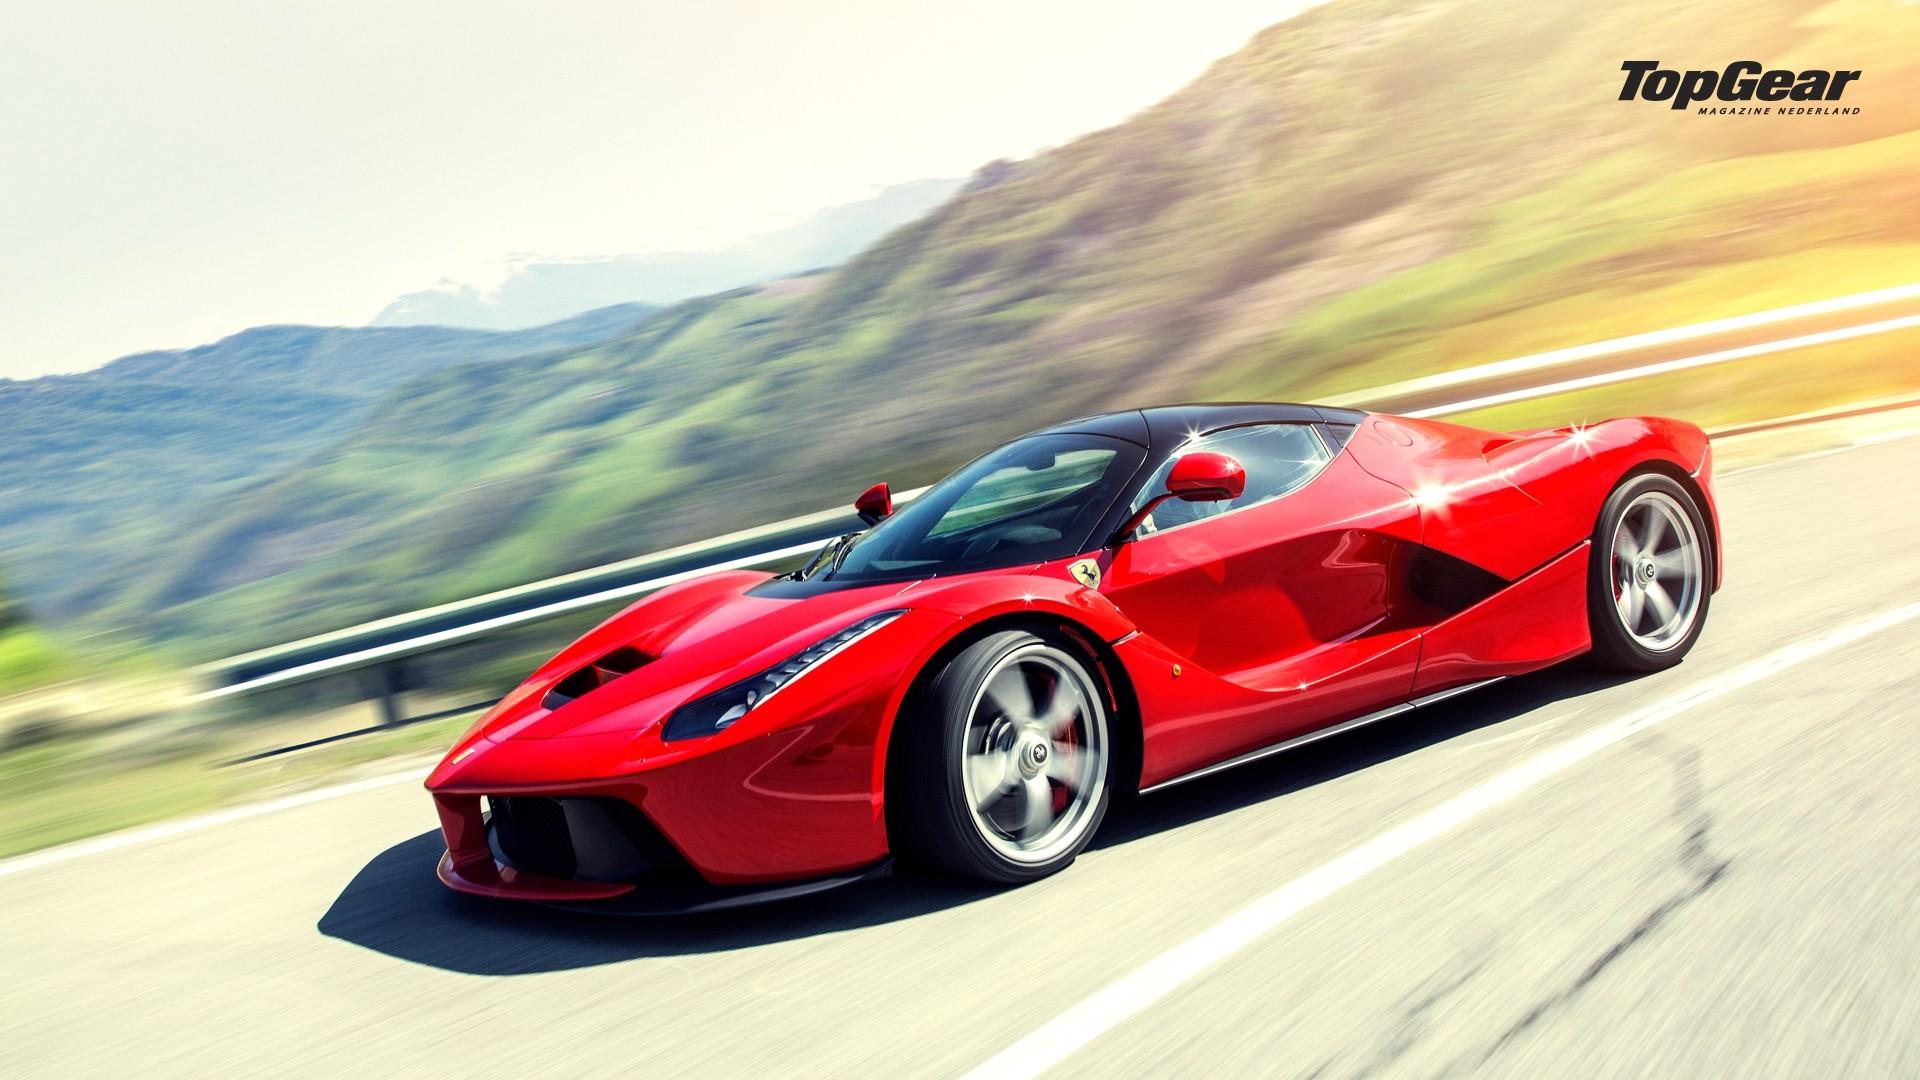 Ferrari laferrari wallpapers 77 images - 2048 supercars ...